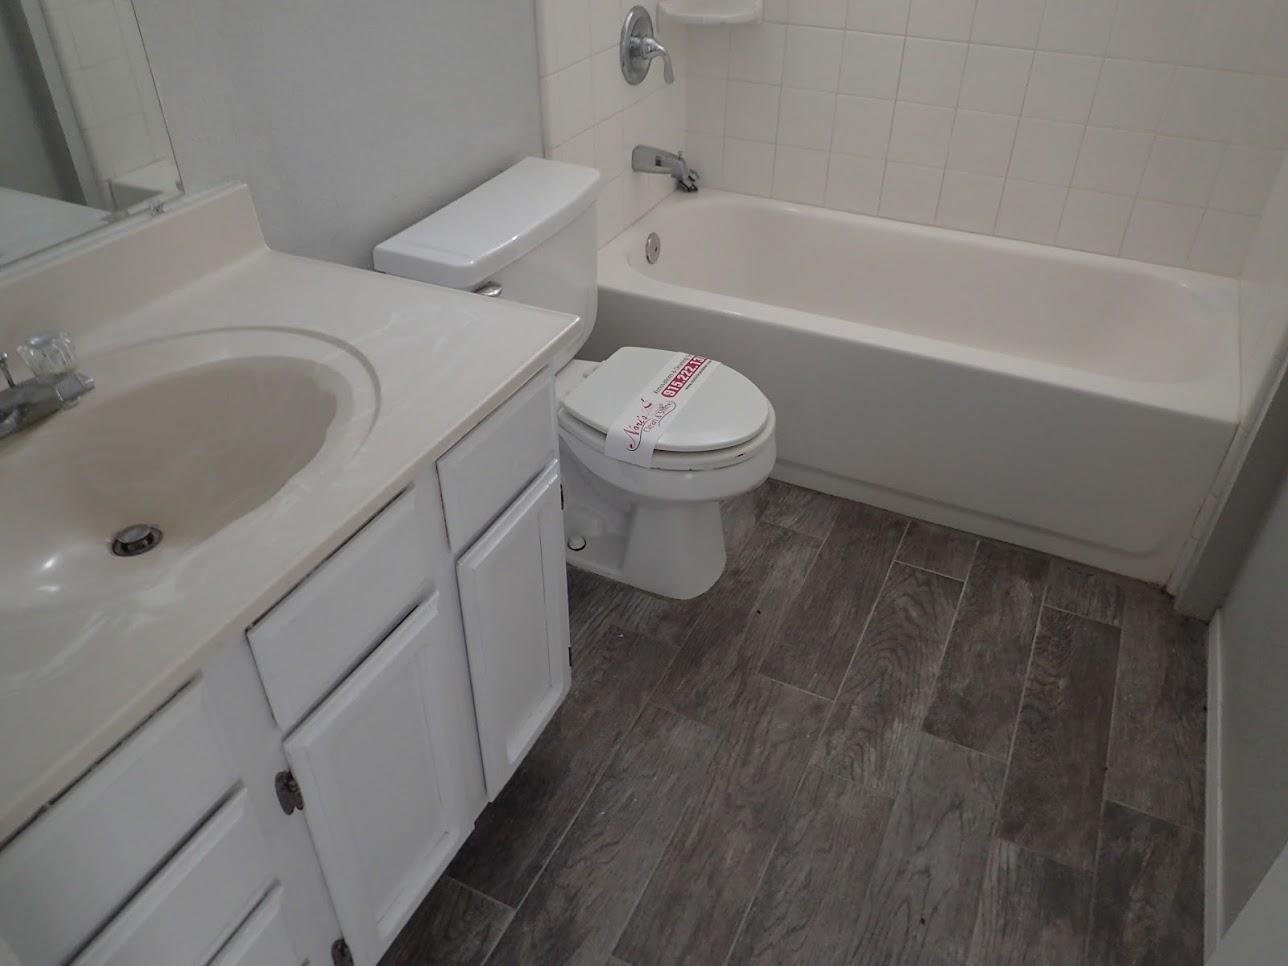 12128 NEW WORLD, El Paso, Texas 79936, 3 Bedrooms Bedrooms, ,2 BathroomsBathrooms,Residential,For sale,NEW WORLD,810708